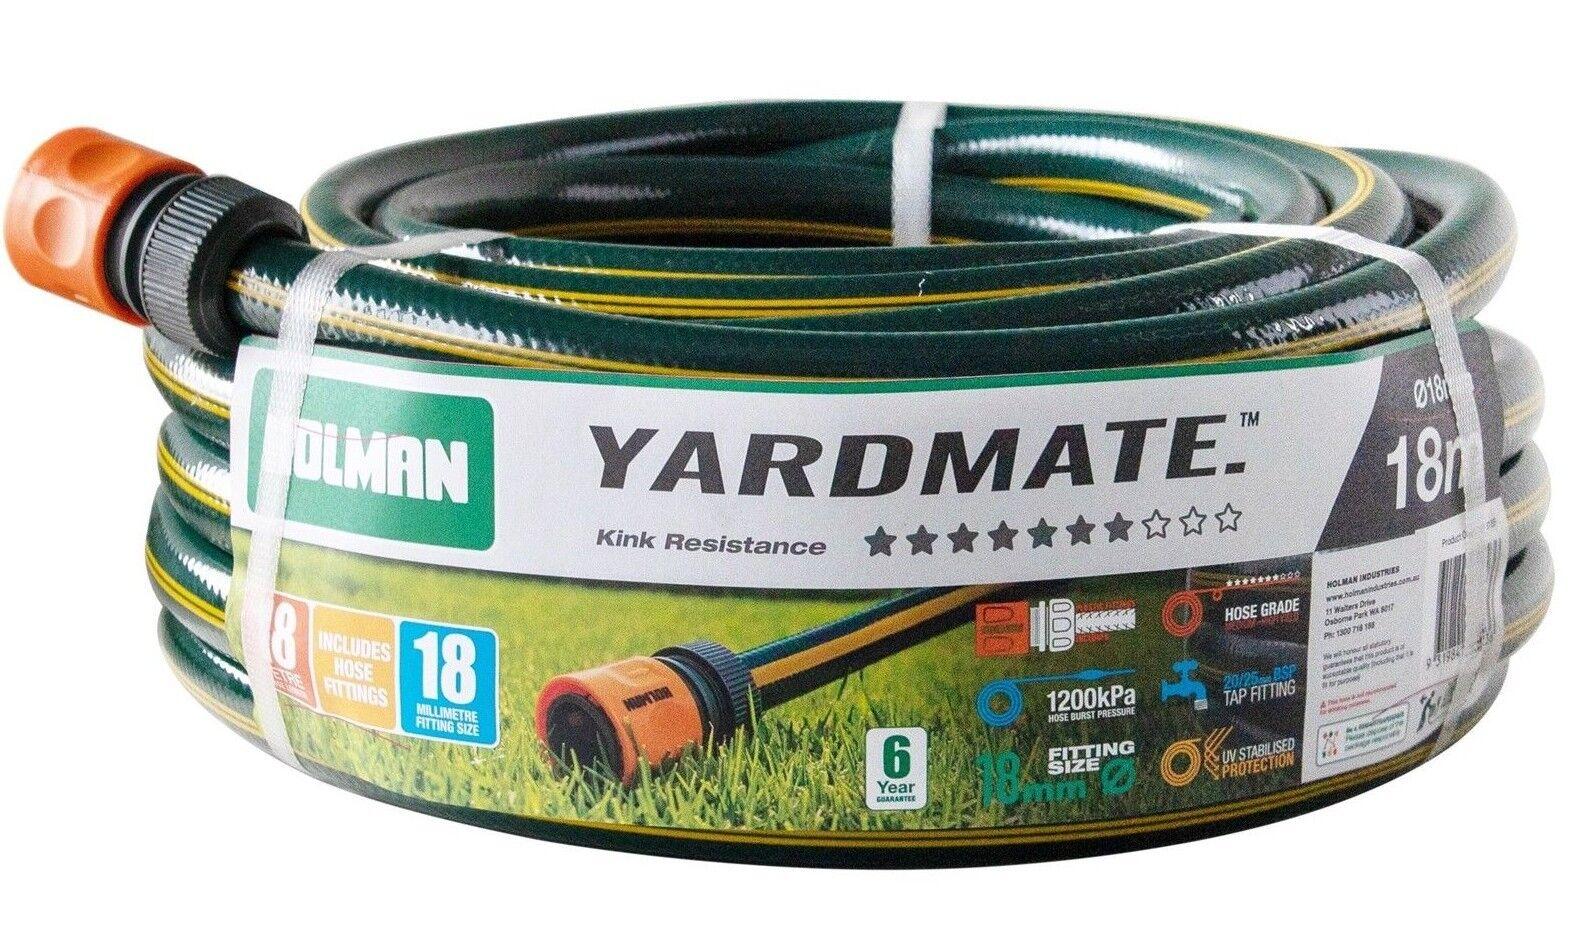 Holman YARDMATE GARDEN HOSE With Fittings *Aust Brand- 18mmx18m Or 18mmx30m